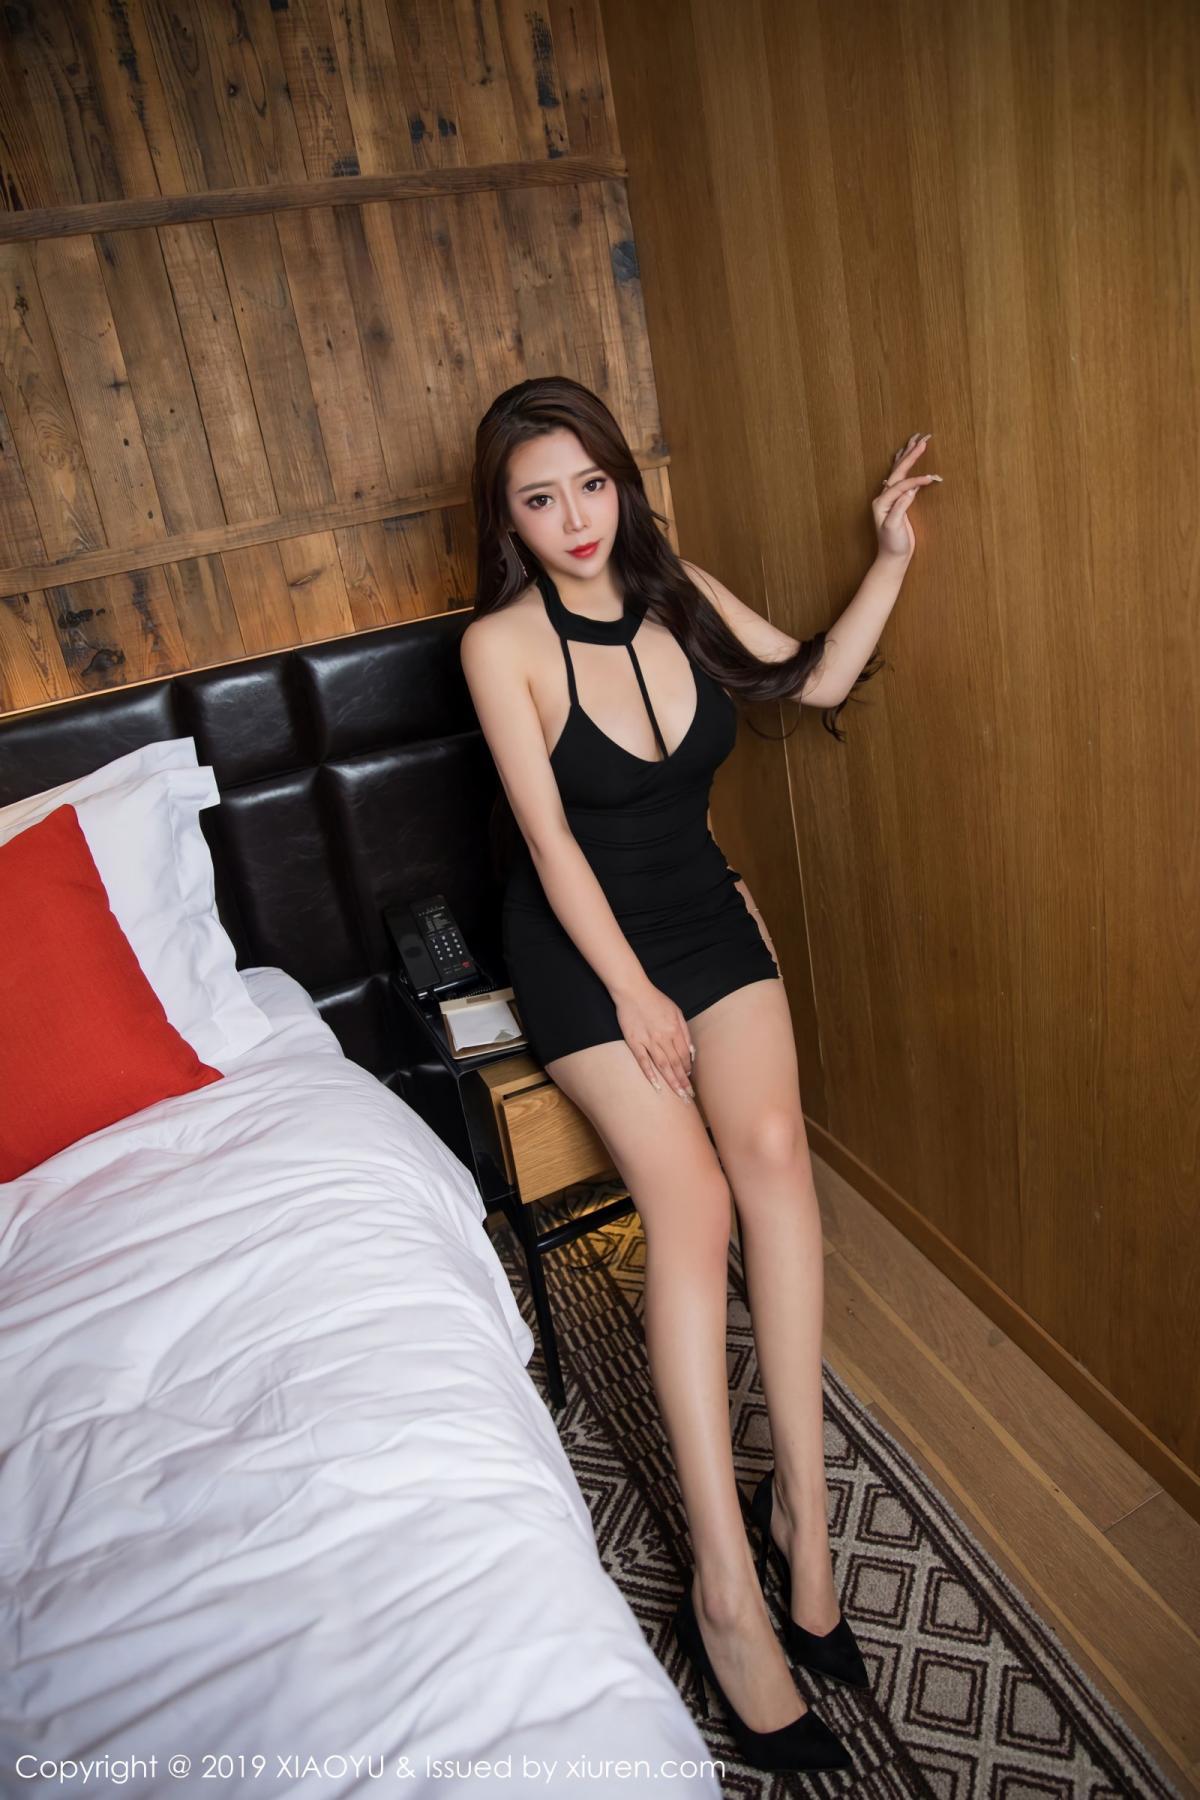 [XiaoYu] Vol.016 Miki Tu 5P, Miki Tu, Tall, XiaoYu